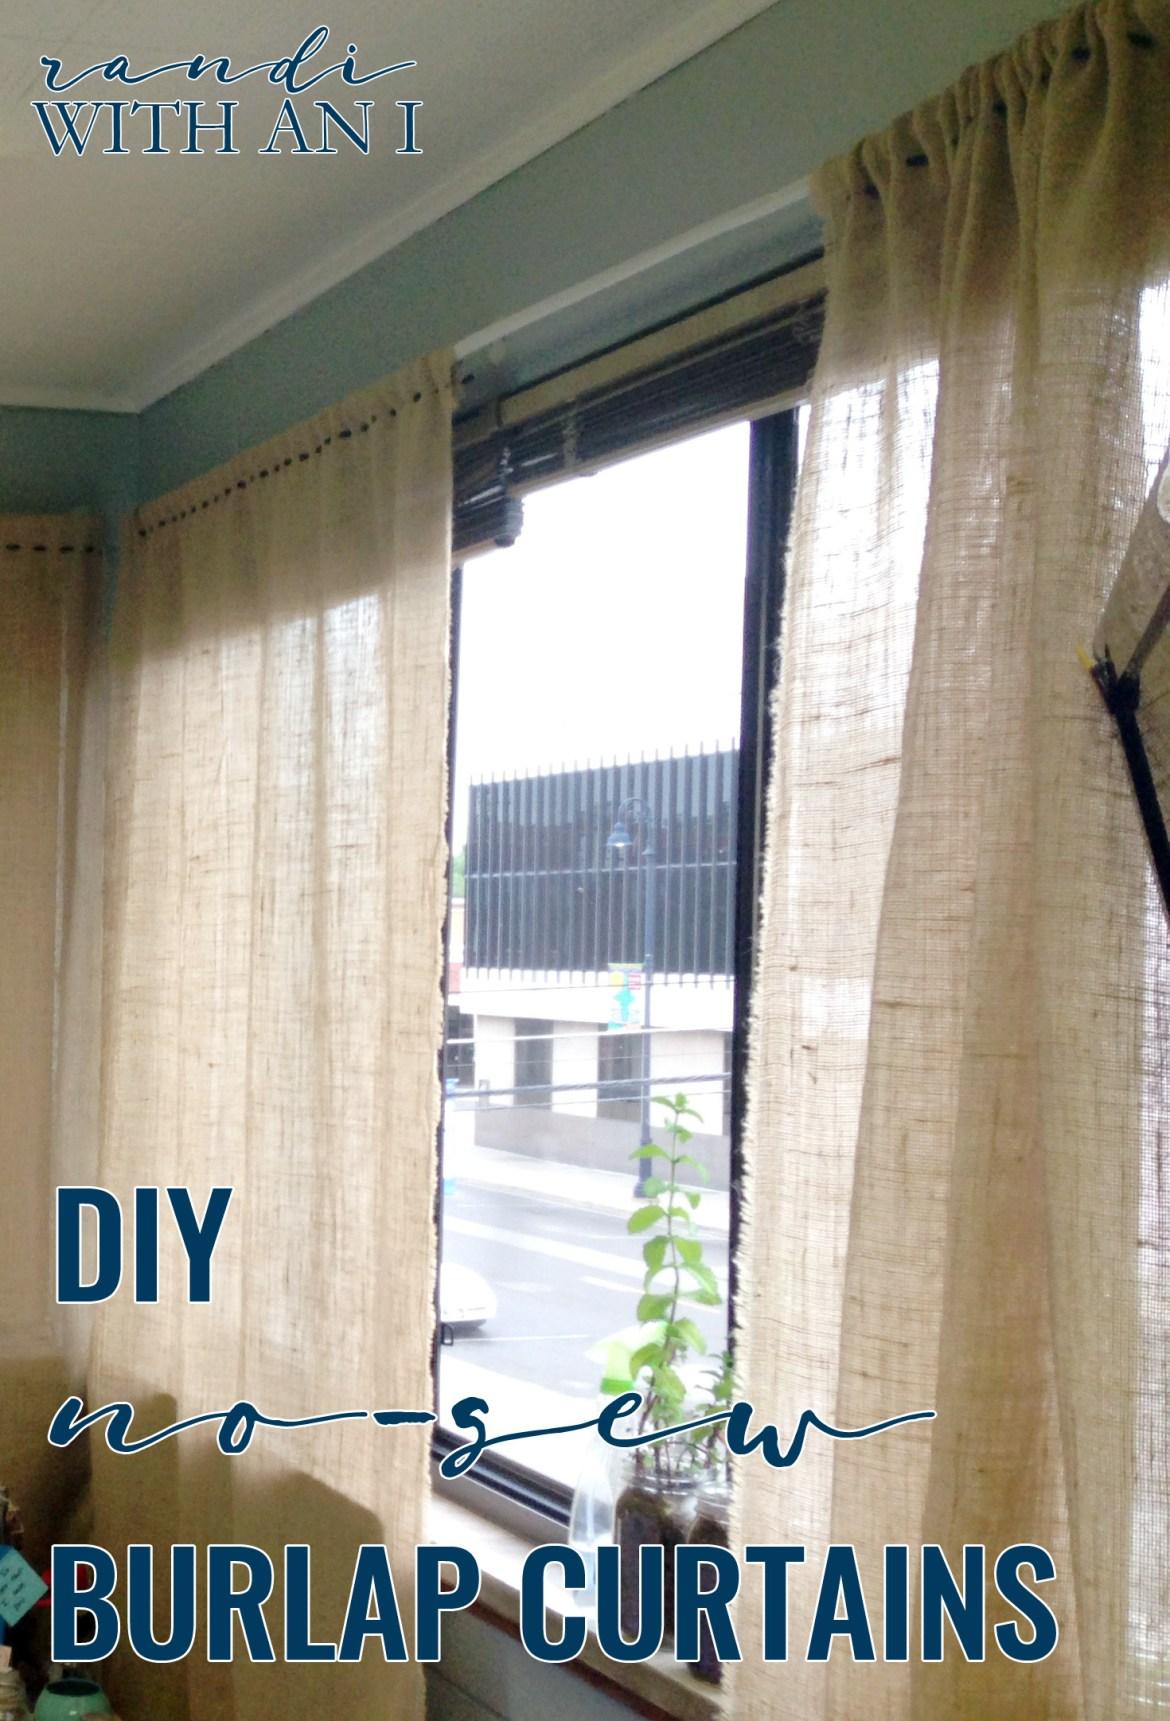 burlap_curtains_diy